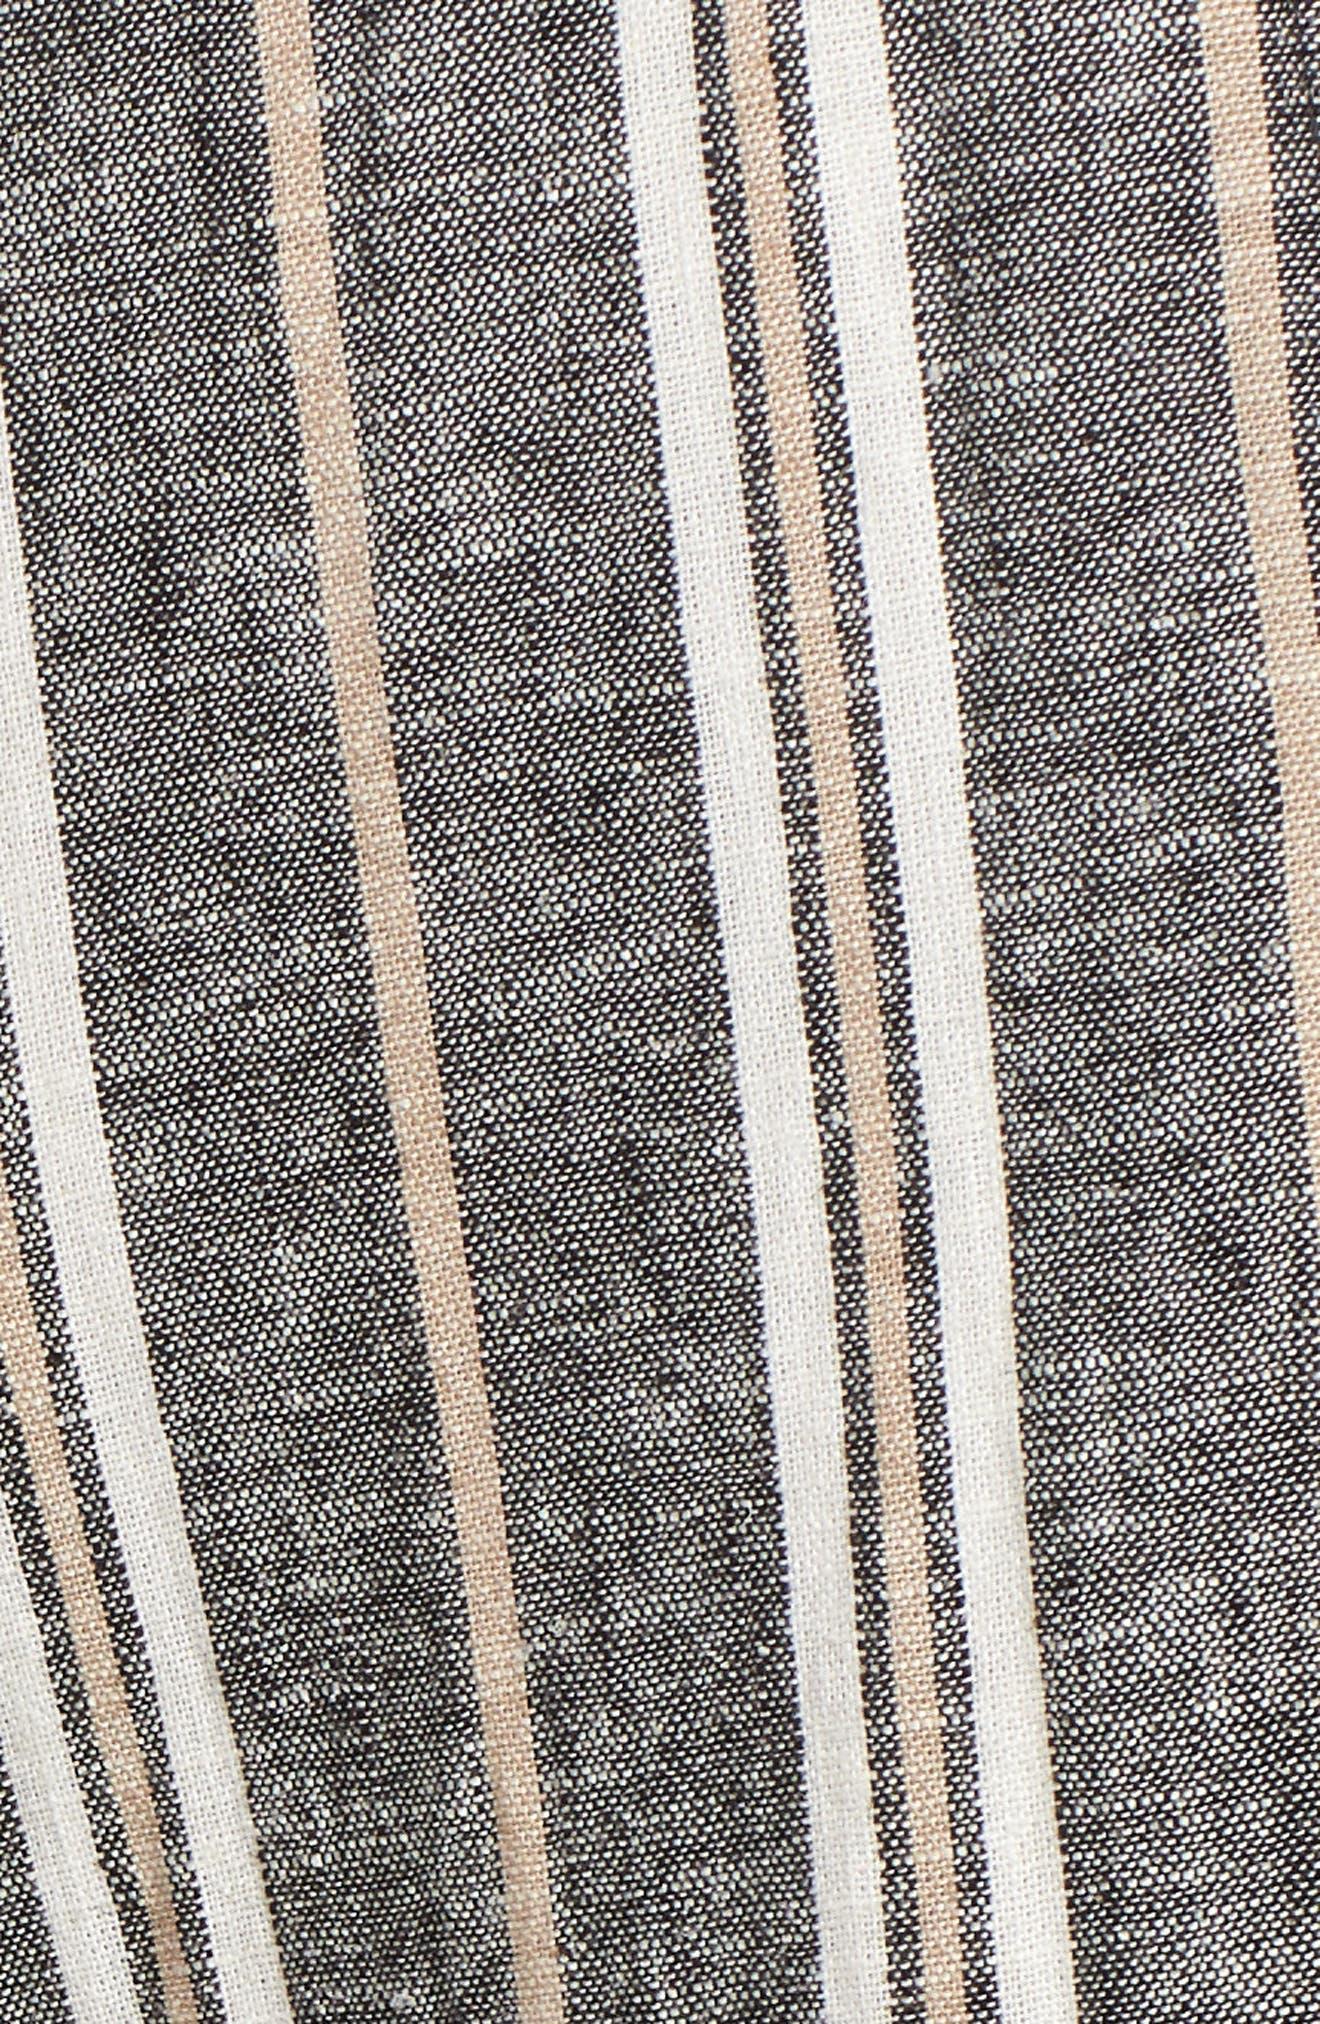 Stripe Linen Blend Pants,                             Alternate thumbnail 6, color,                             Black Betsty Stripe